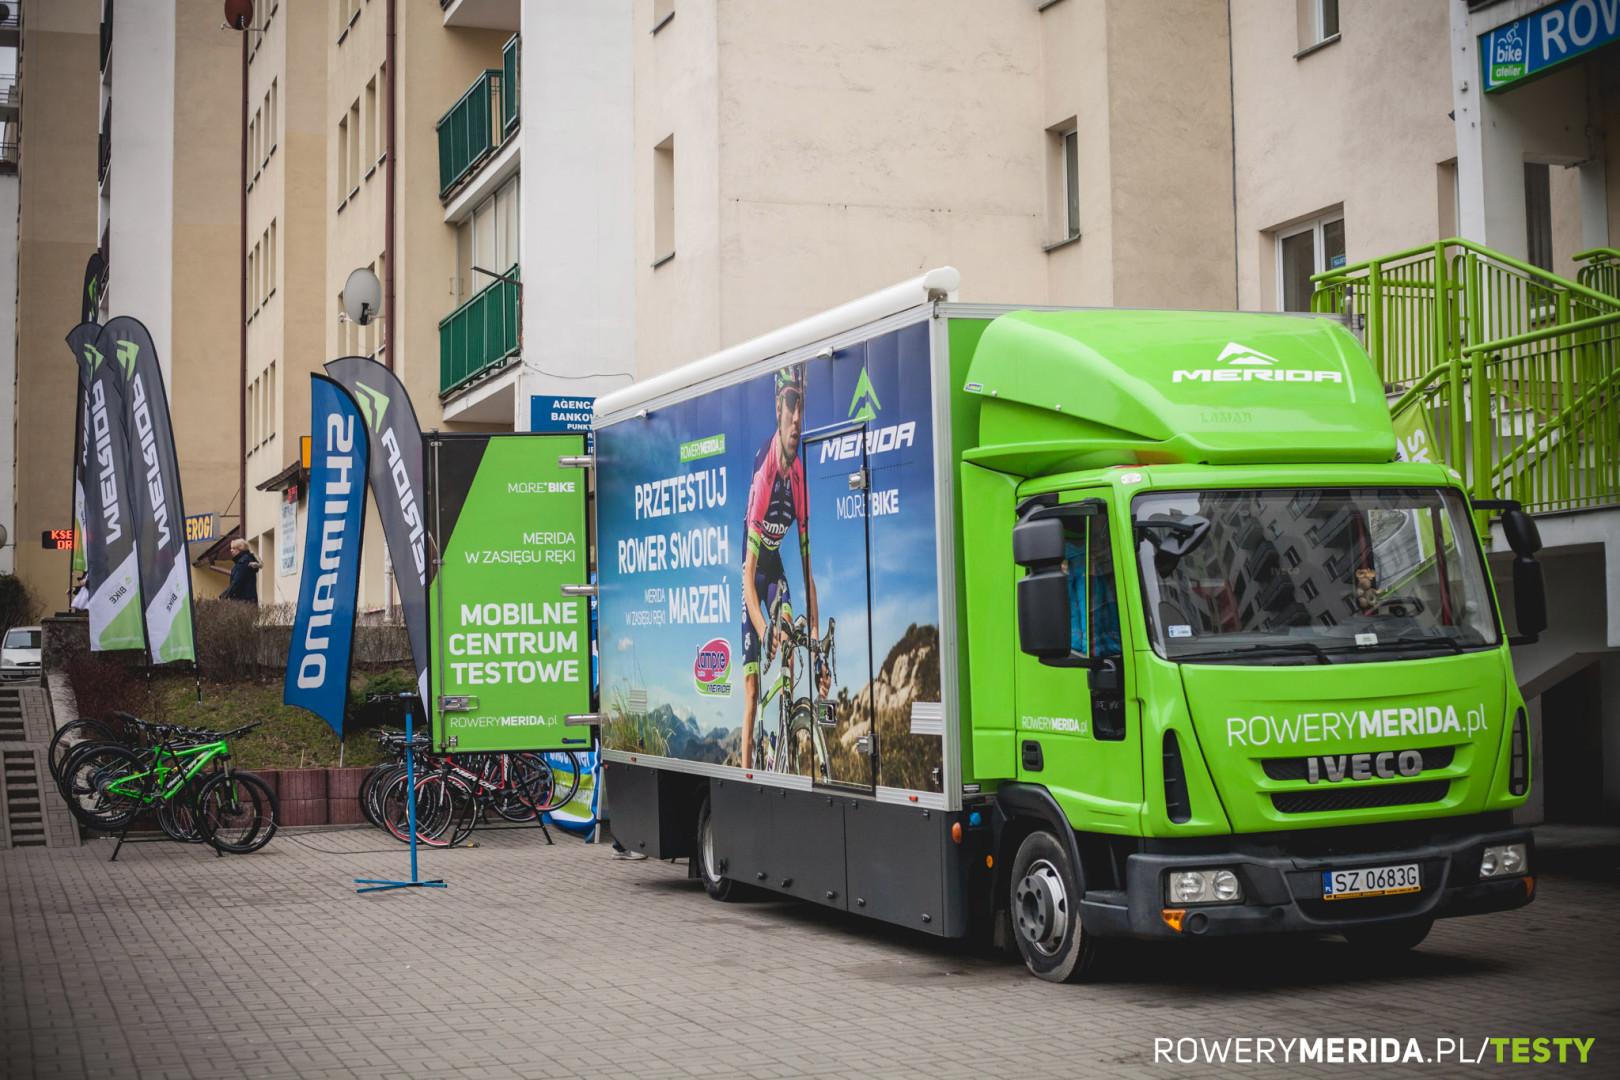 Mobilne centrum testowe merida polska 2016 6